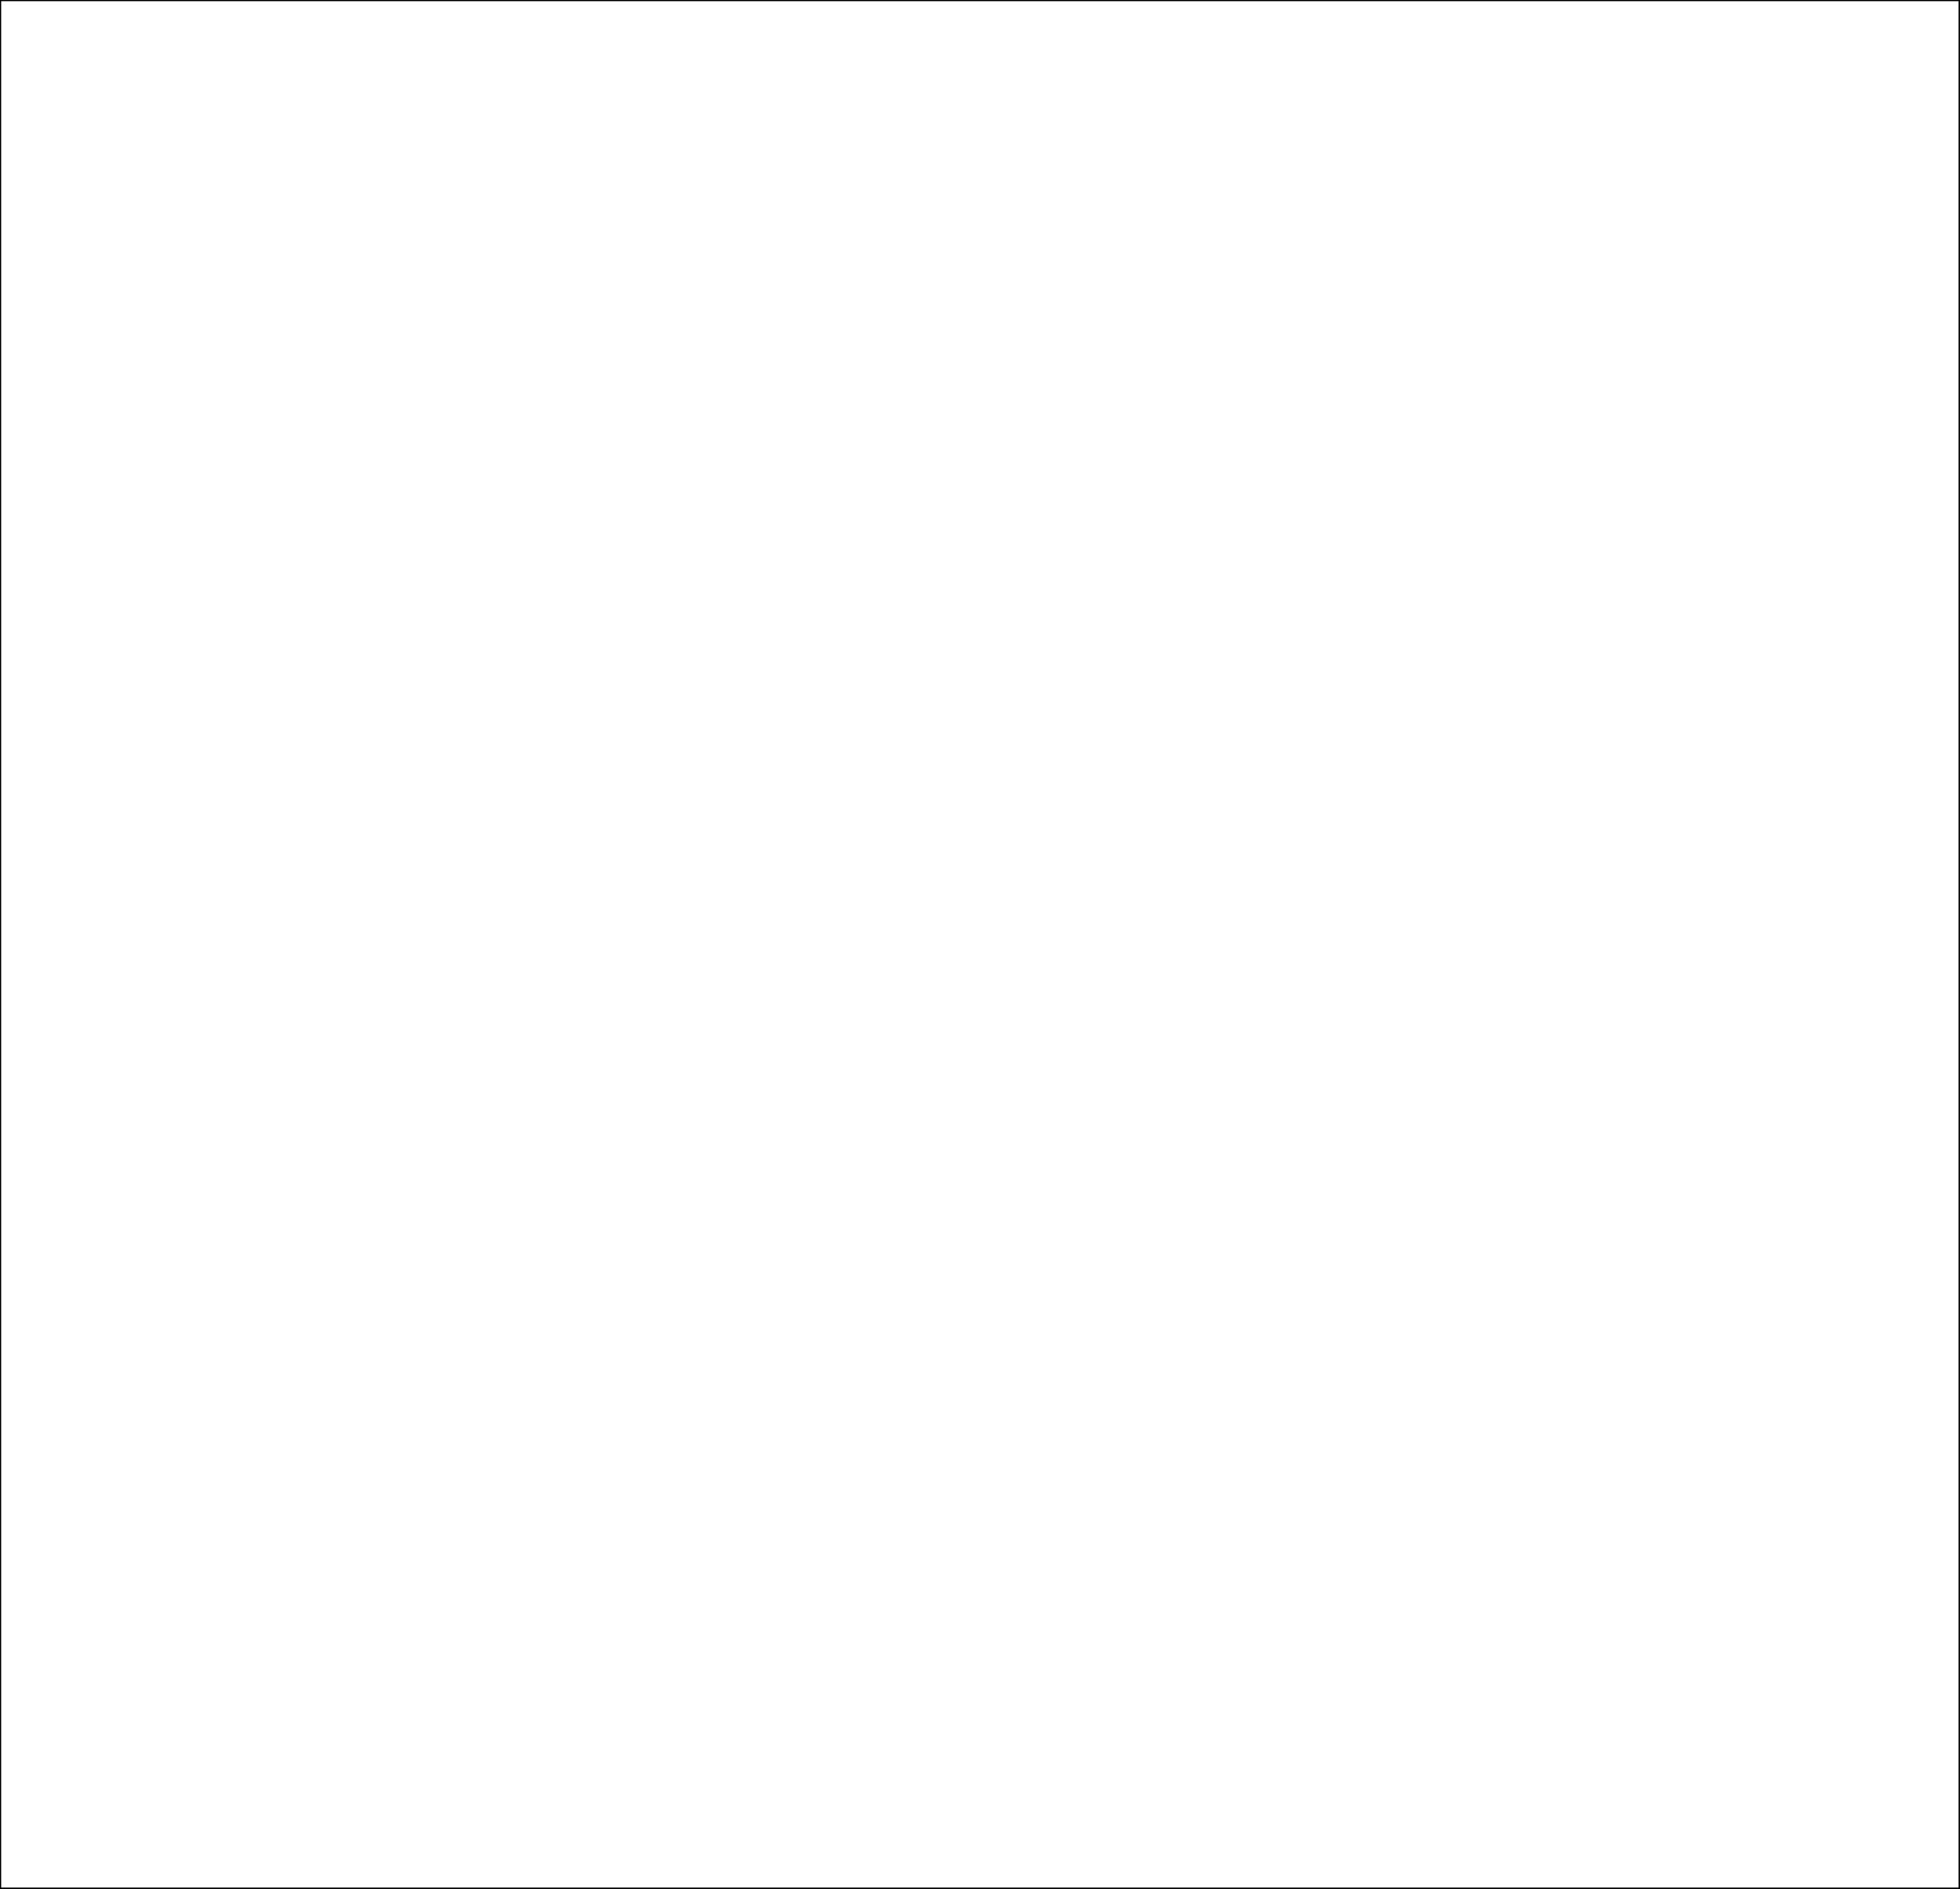 research positions - July 1 - present Assistant professor, Department of Ecology and Evolution, University of LausanneJan. 2013 - June 30 Postdoc in Richard Benton's Lab, Center for Integrative Genomics, University of LausanneMarch 2017 - present Member of the Swiss Institute of BioinformaticsOct. 2008 - Dec. 2012 Postdoc in Andrew G. Clark Lab, Department of Molecular Biology and Genetics, Cornell University